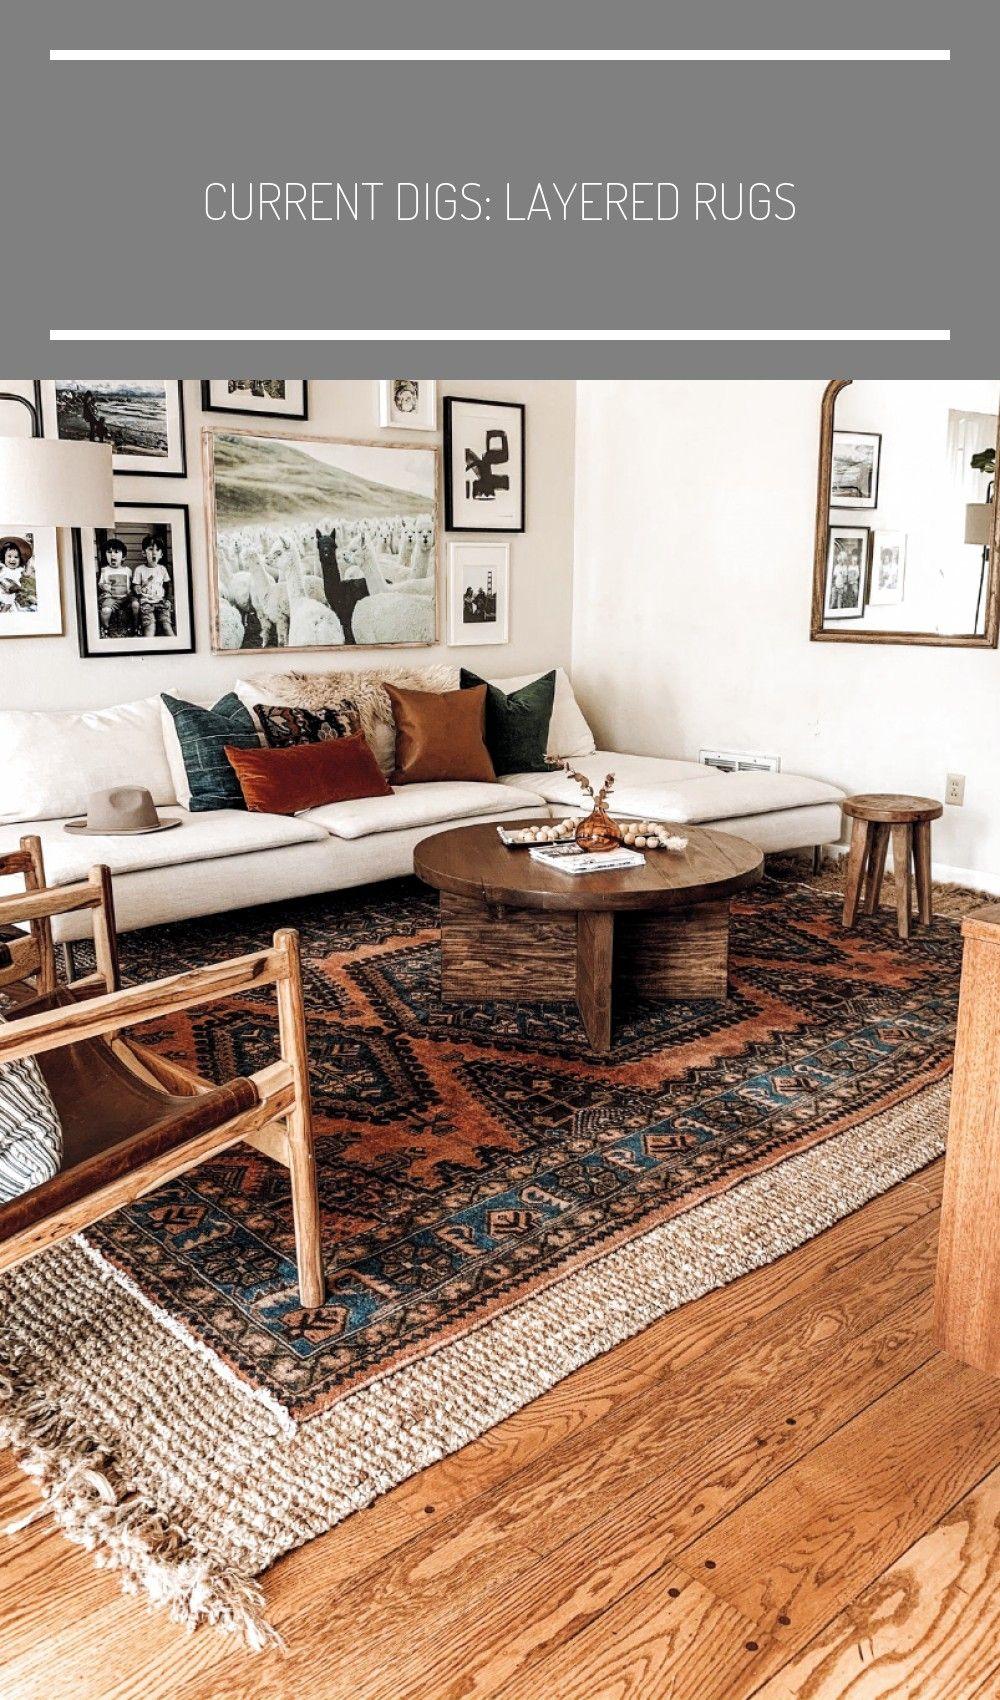 Tapis En Couches De Salon Couches Rug On Carpet Living Room Salon Tapis Layered Rugs Bohemian Bedroom In 2020 Layered Rugs Rugs On Carpet Rugs